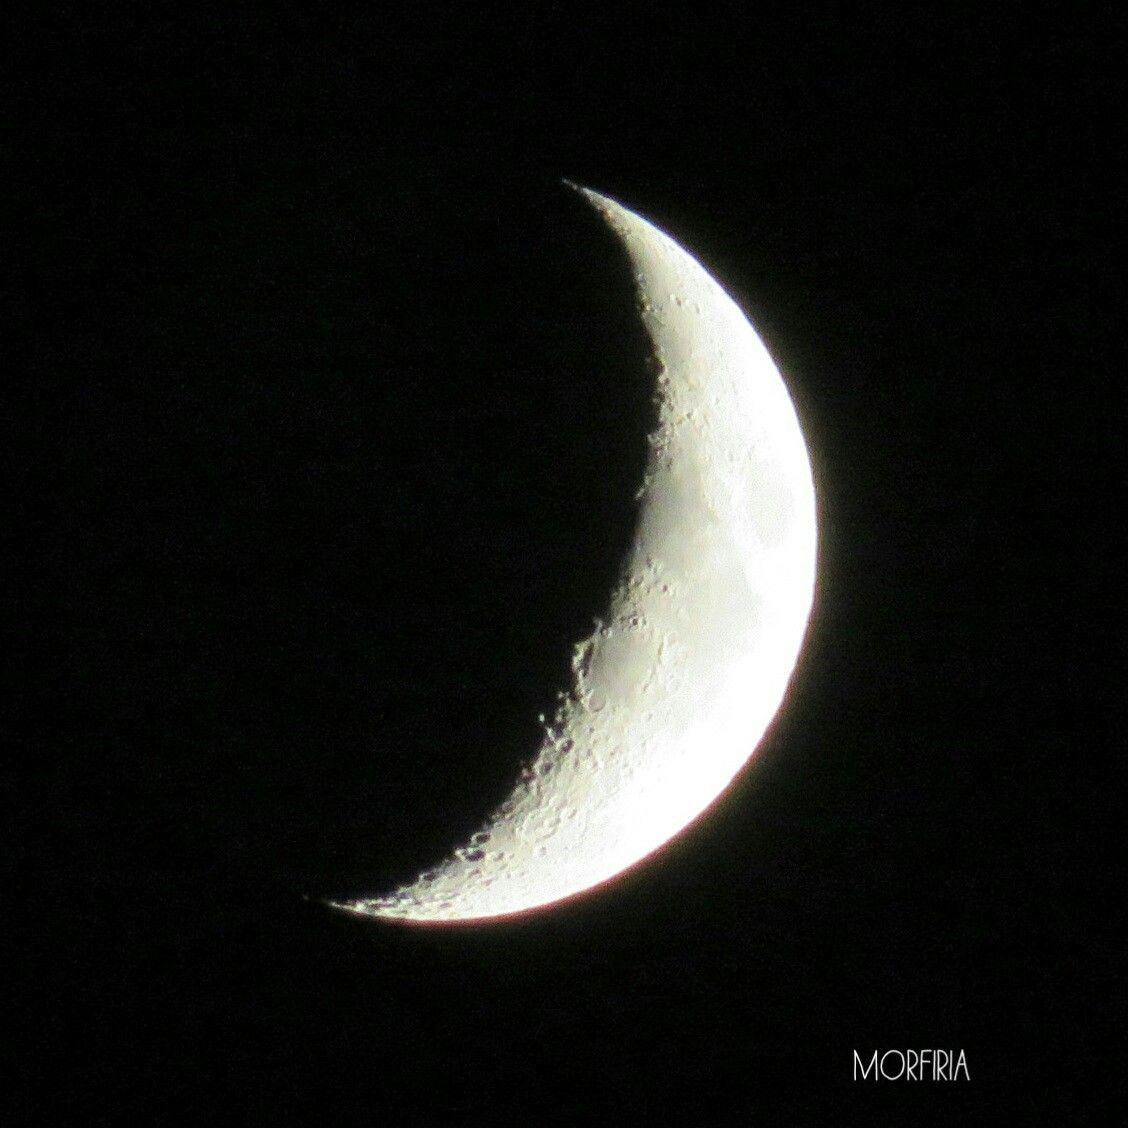 Moon - Mond - Luna